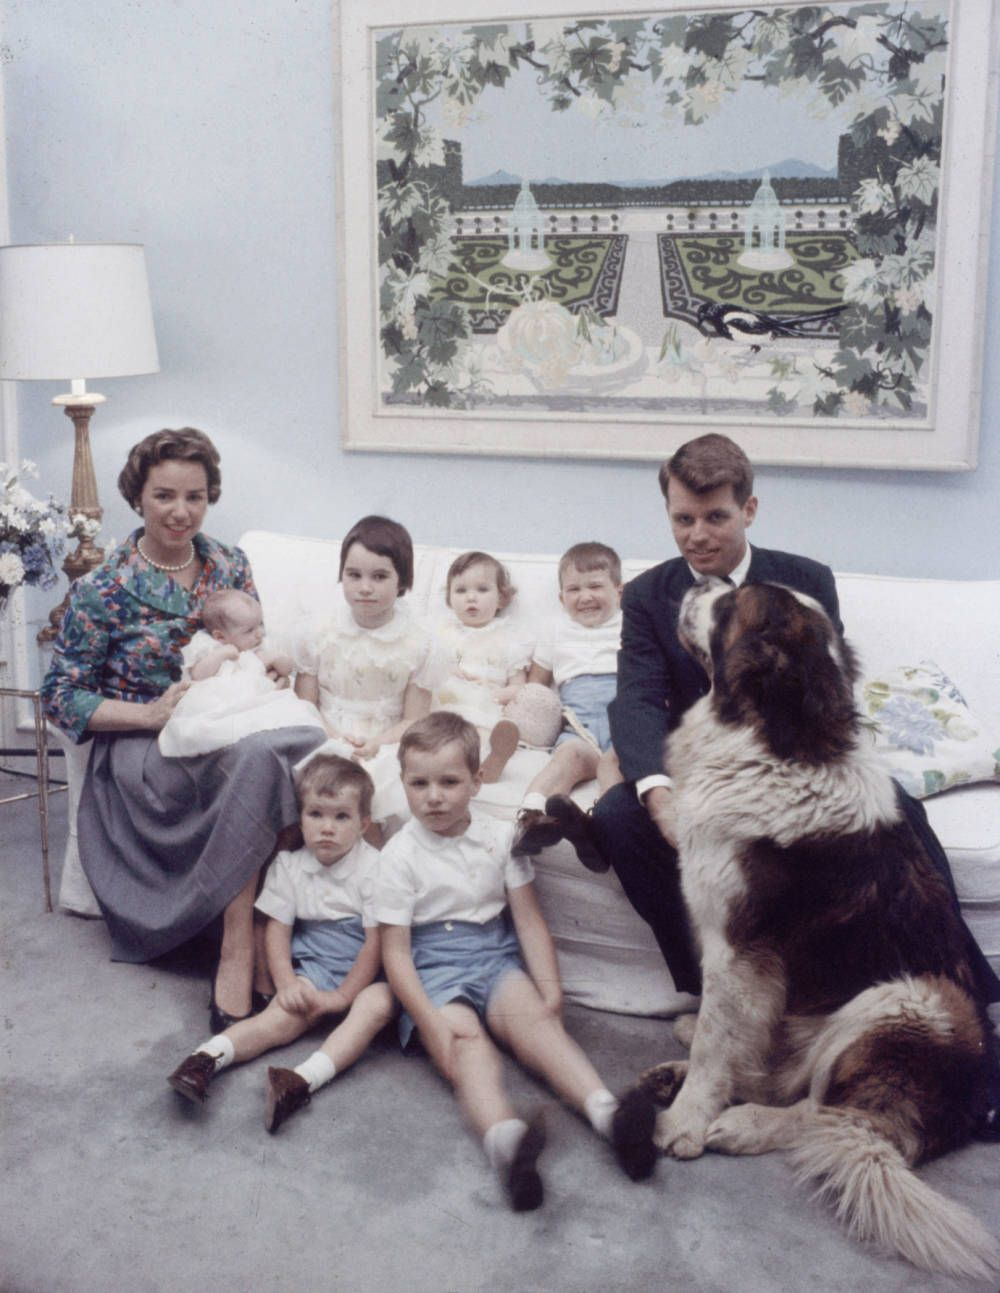 RFK's family portrait with their St. Bernard. - TownandCountrymag.com